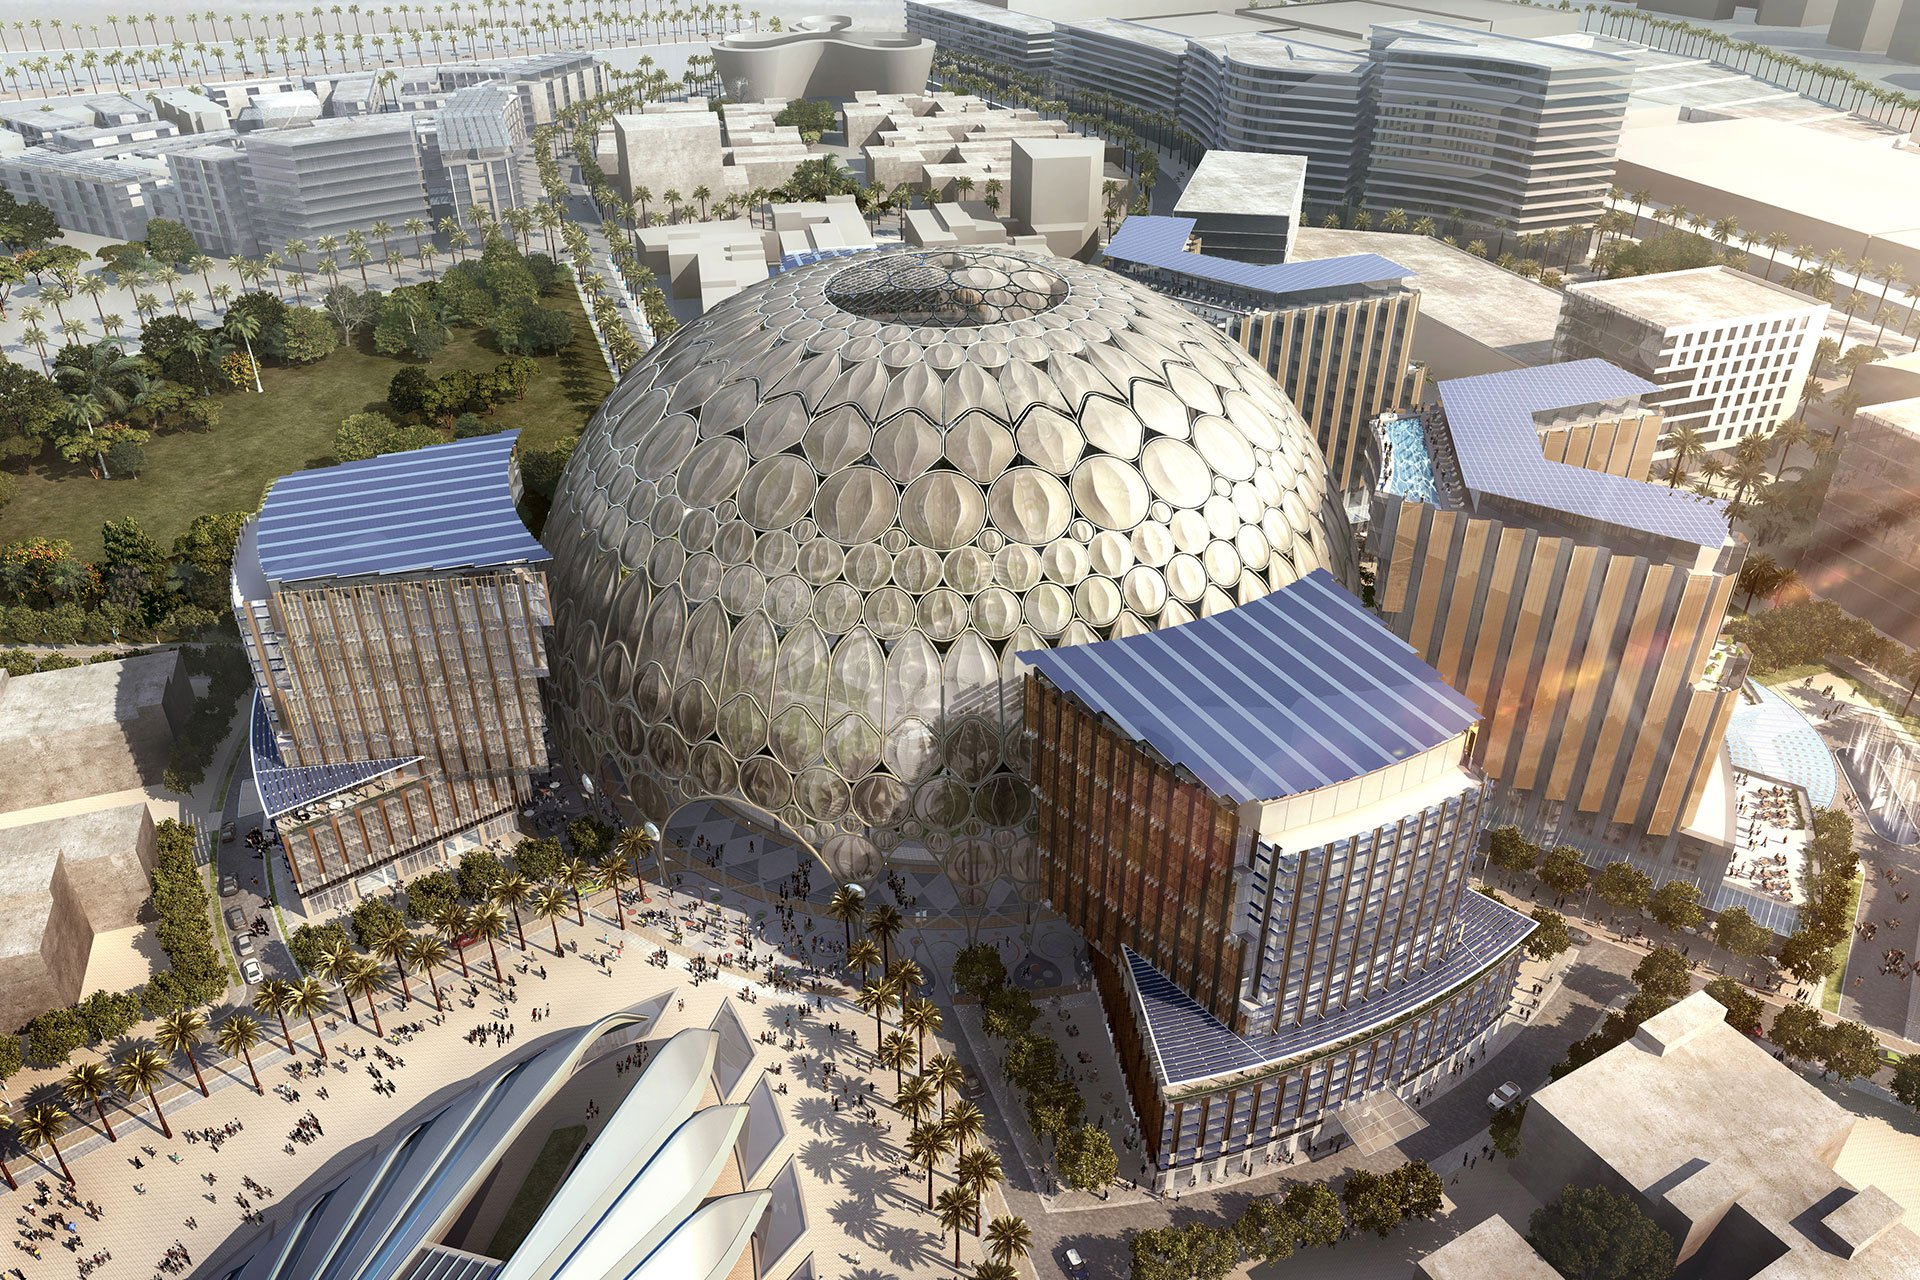 WORLD EXPO DUBAI – AL WASL PLAZA aerial day